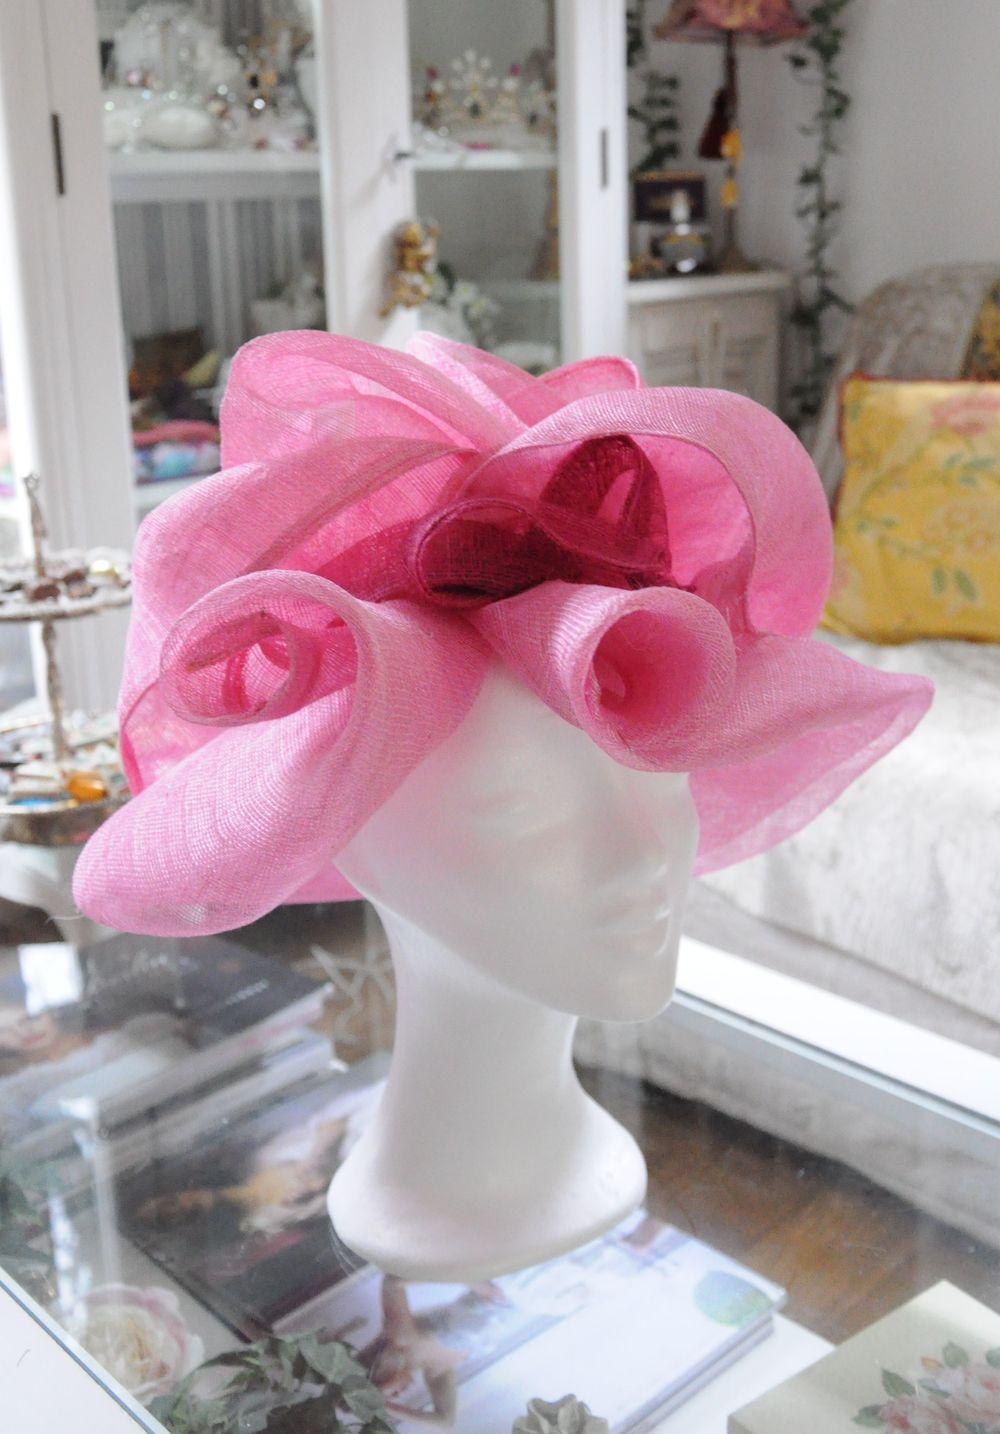 Chapeau en sisal rose, sur mesure